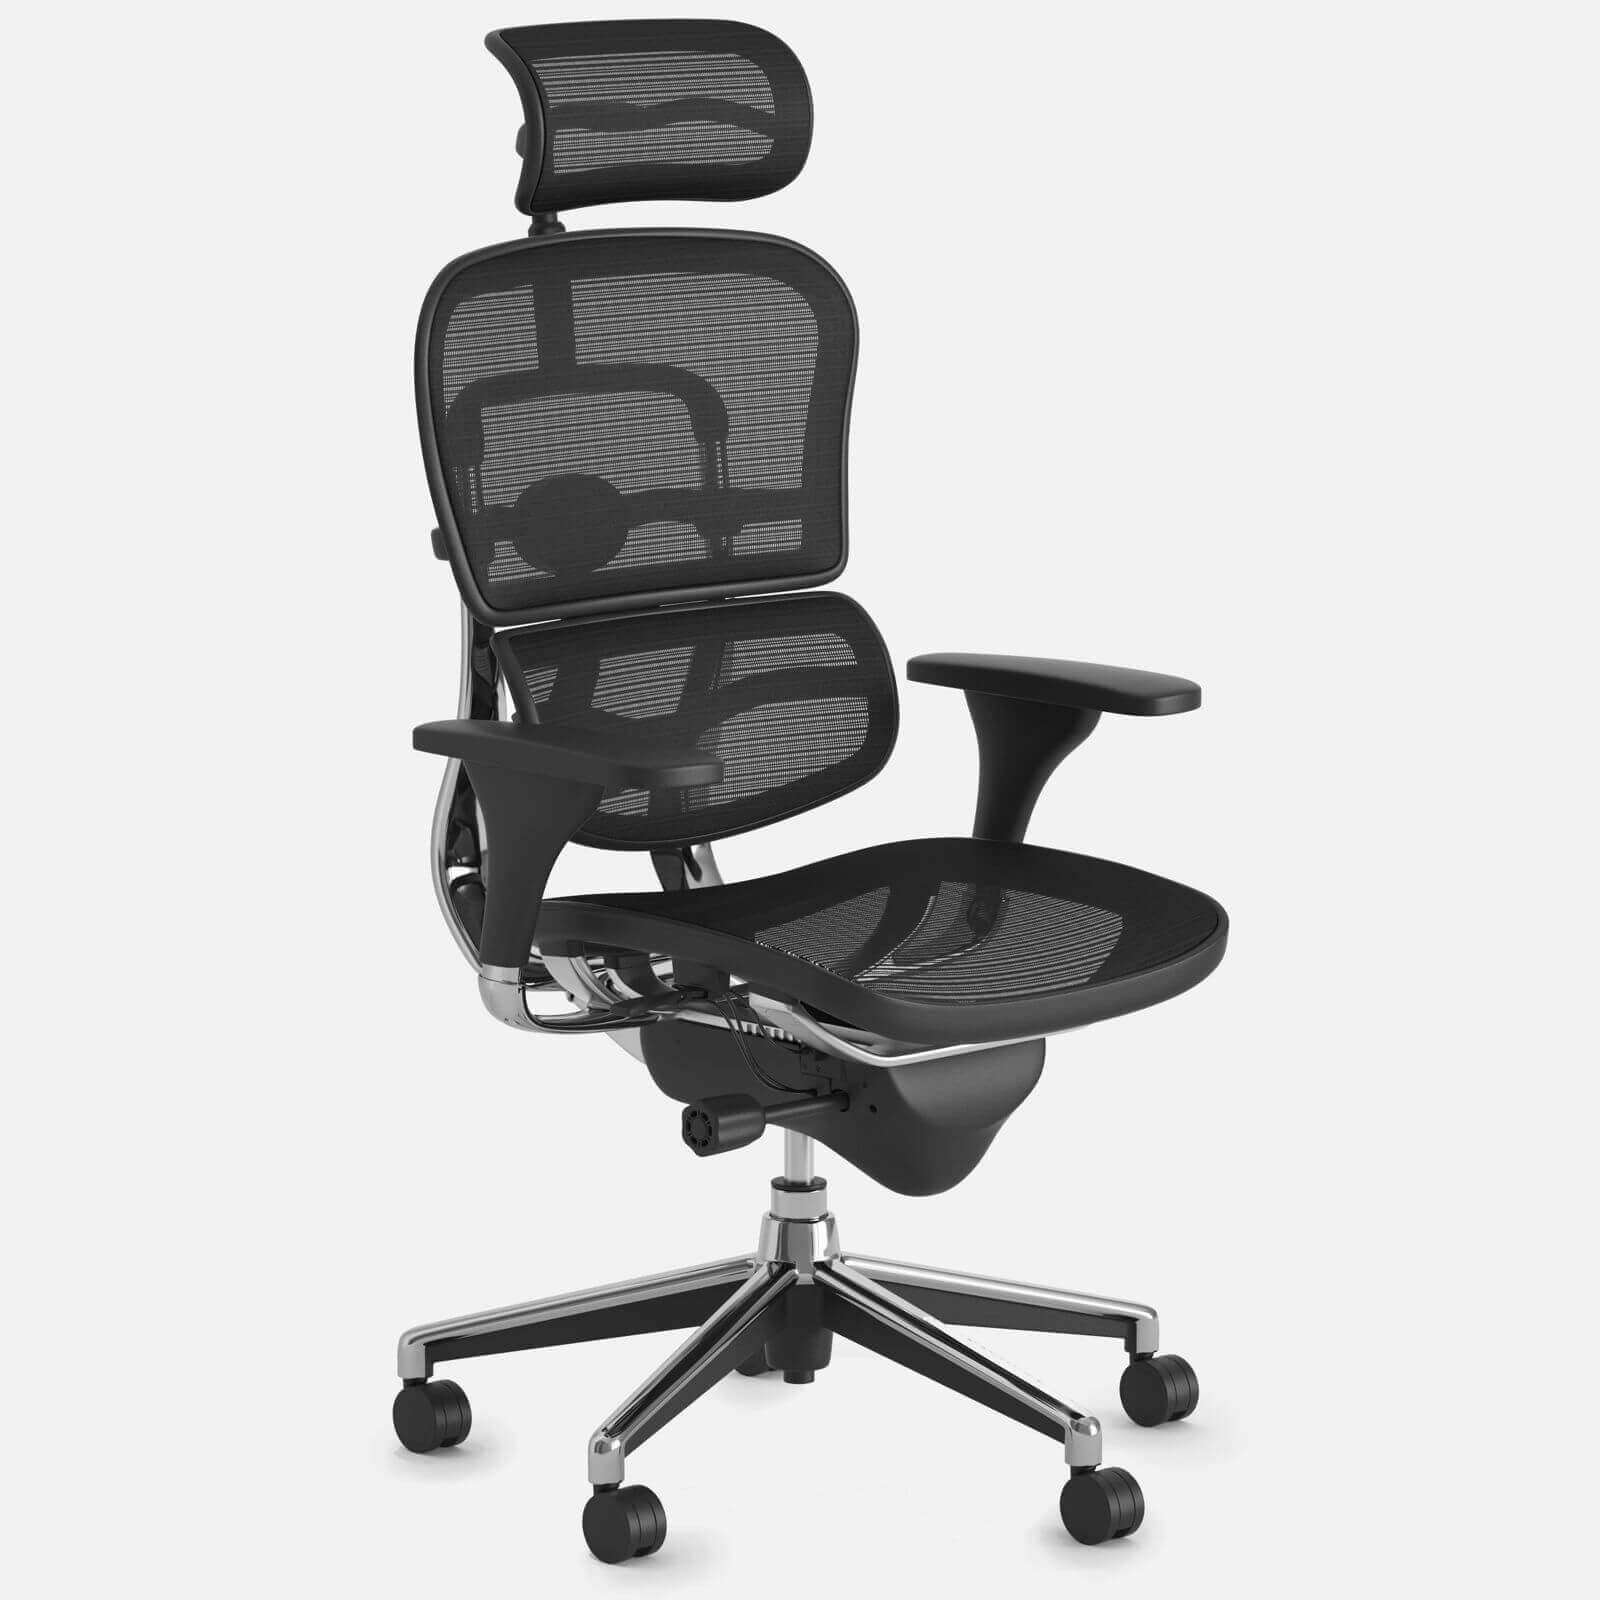 Ergohuman High Back Swivel Chair 3d Model